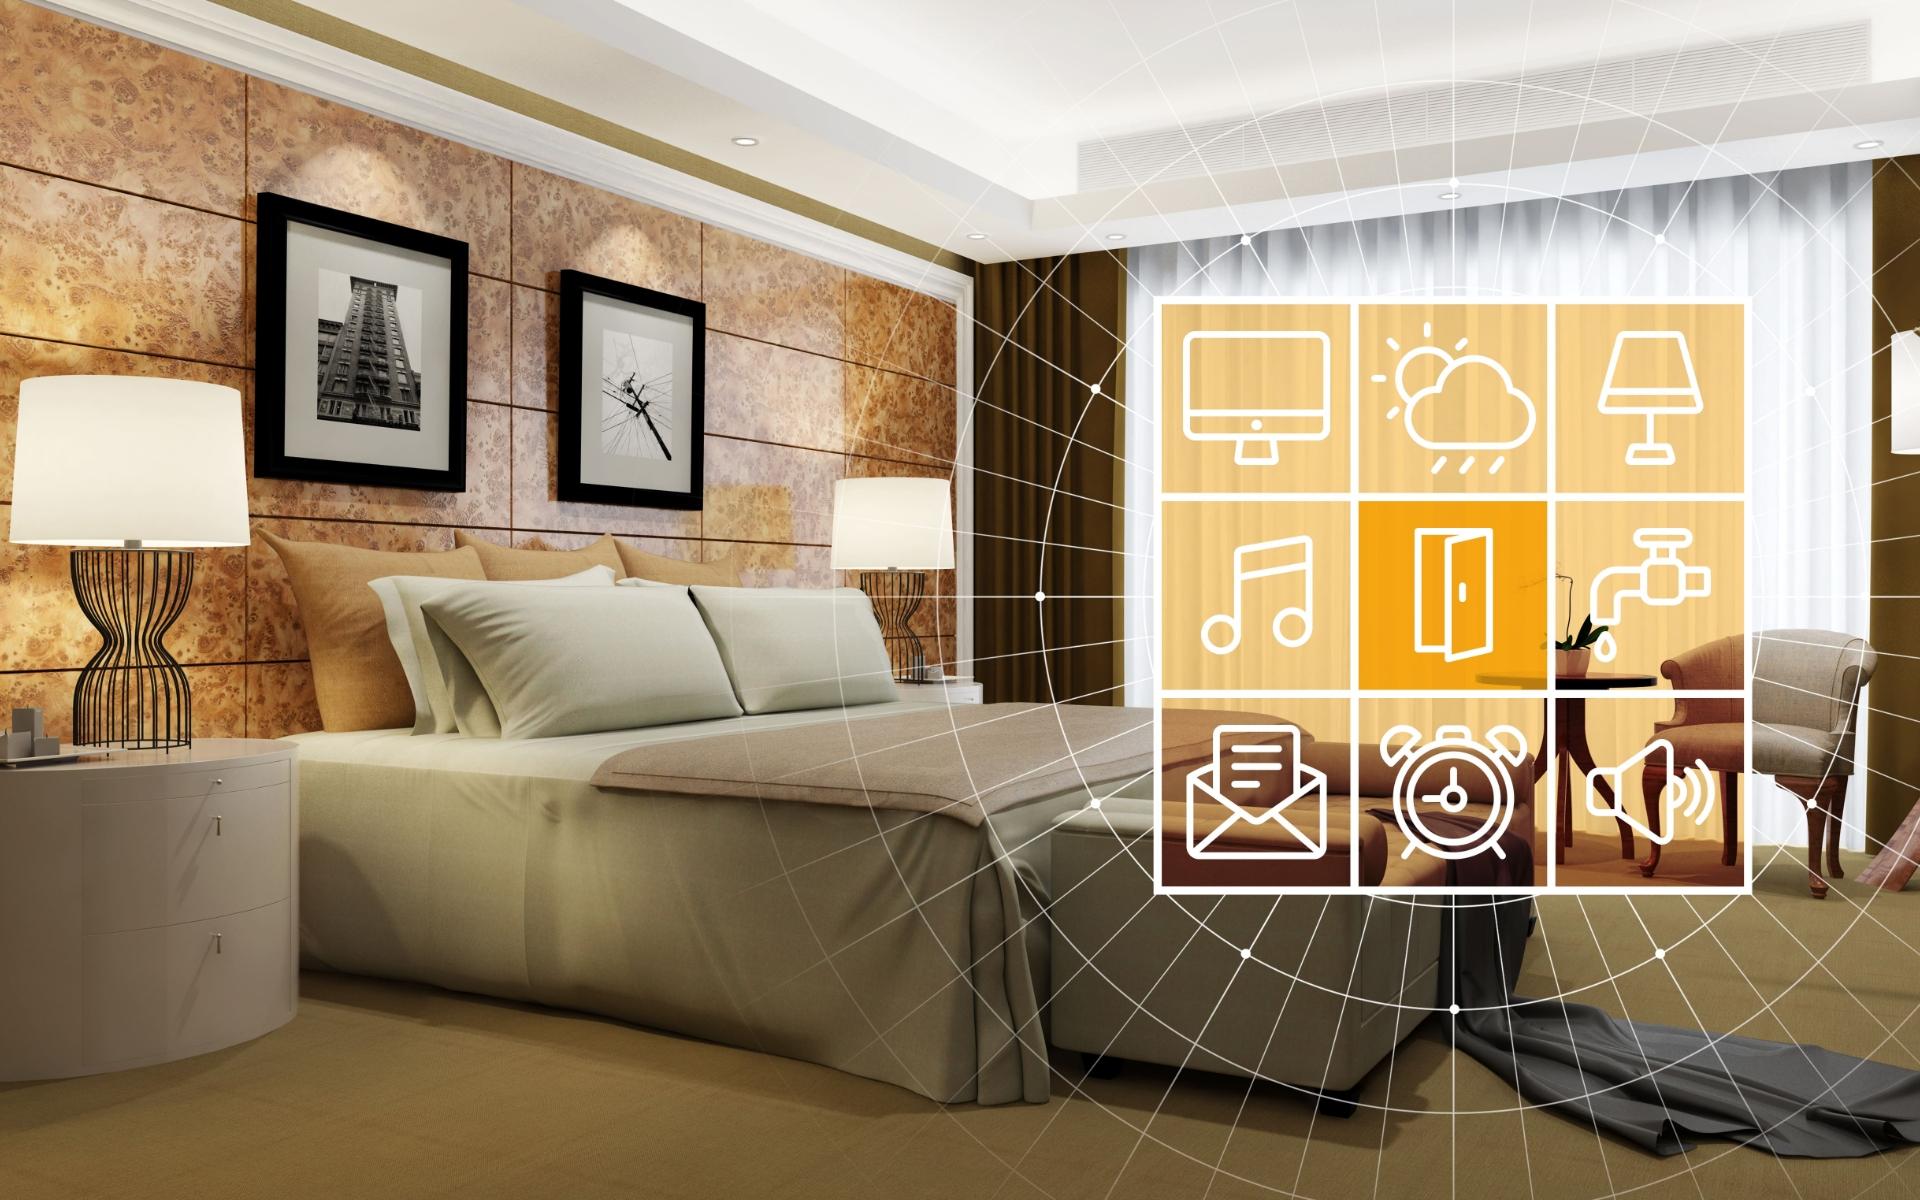 Hotel technoloty inside room experience